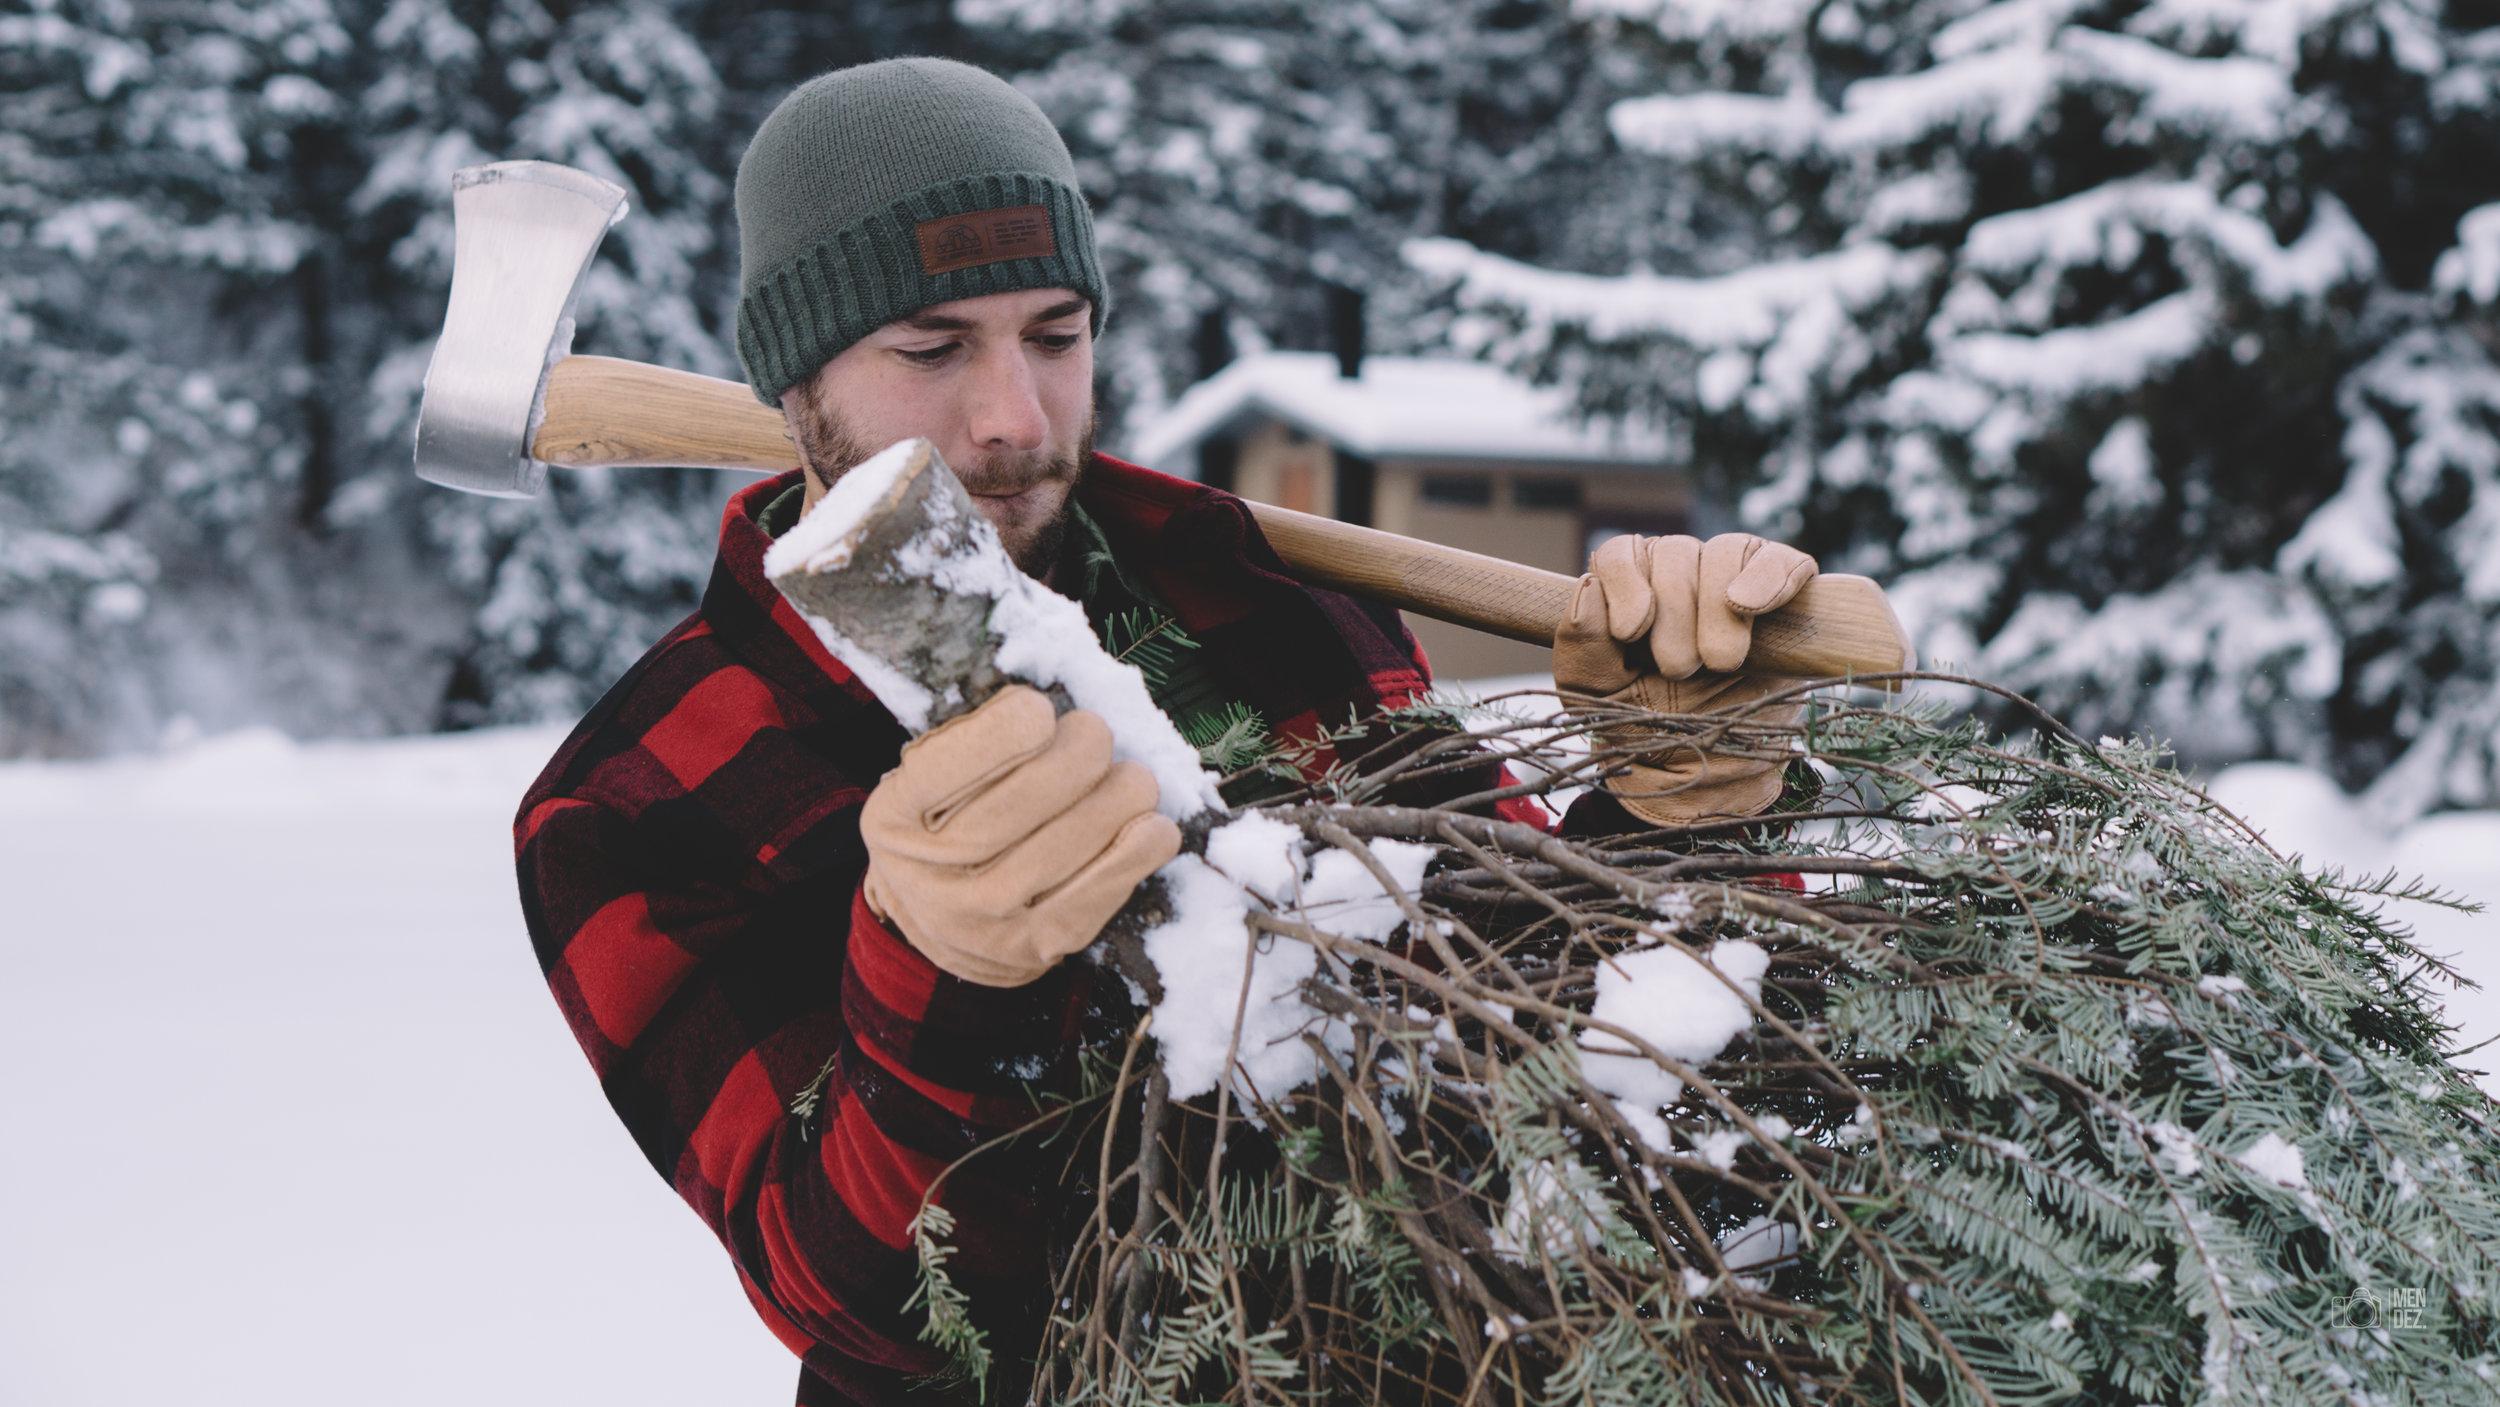 Esteban, Reindeer Games Photoshoot Location   December 2016